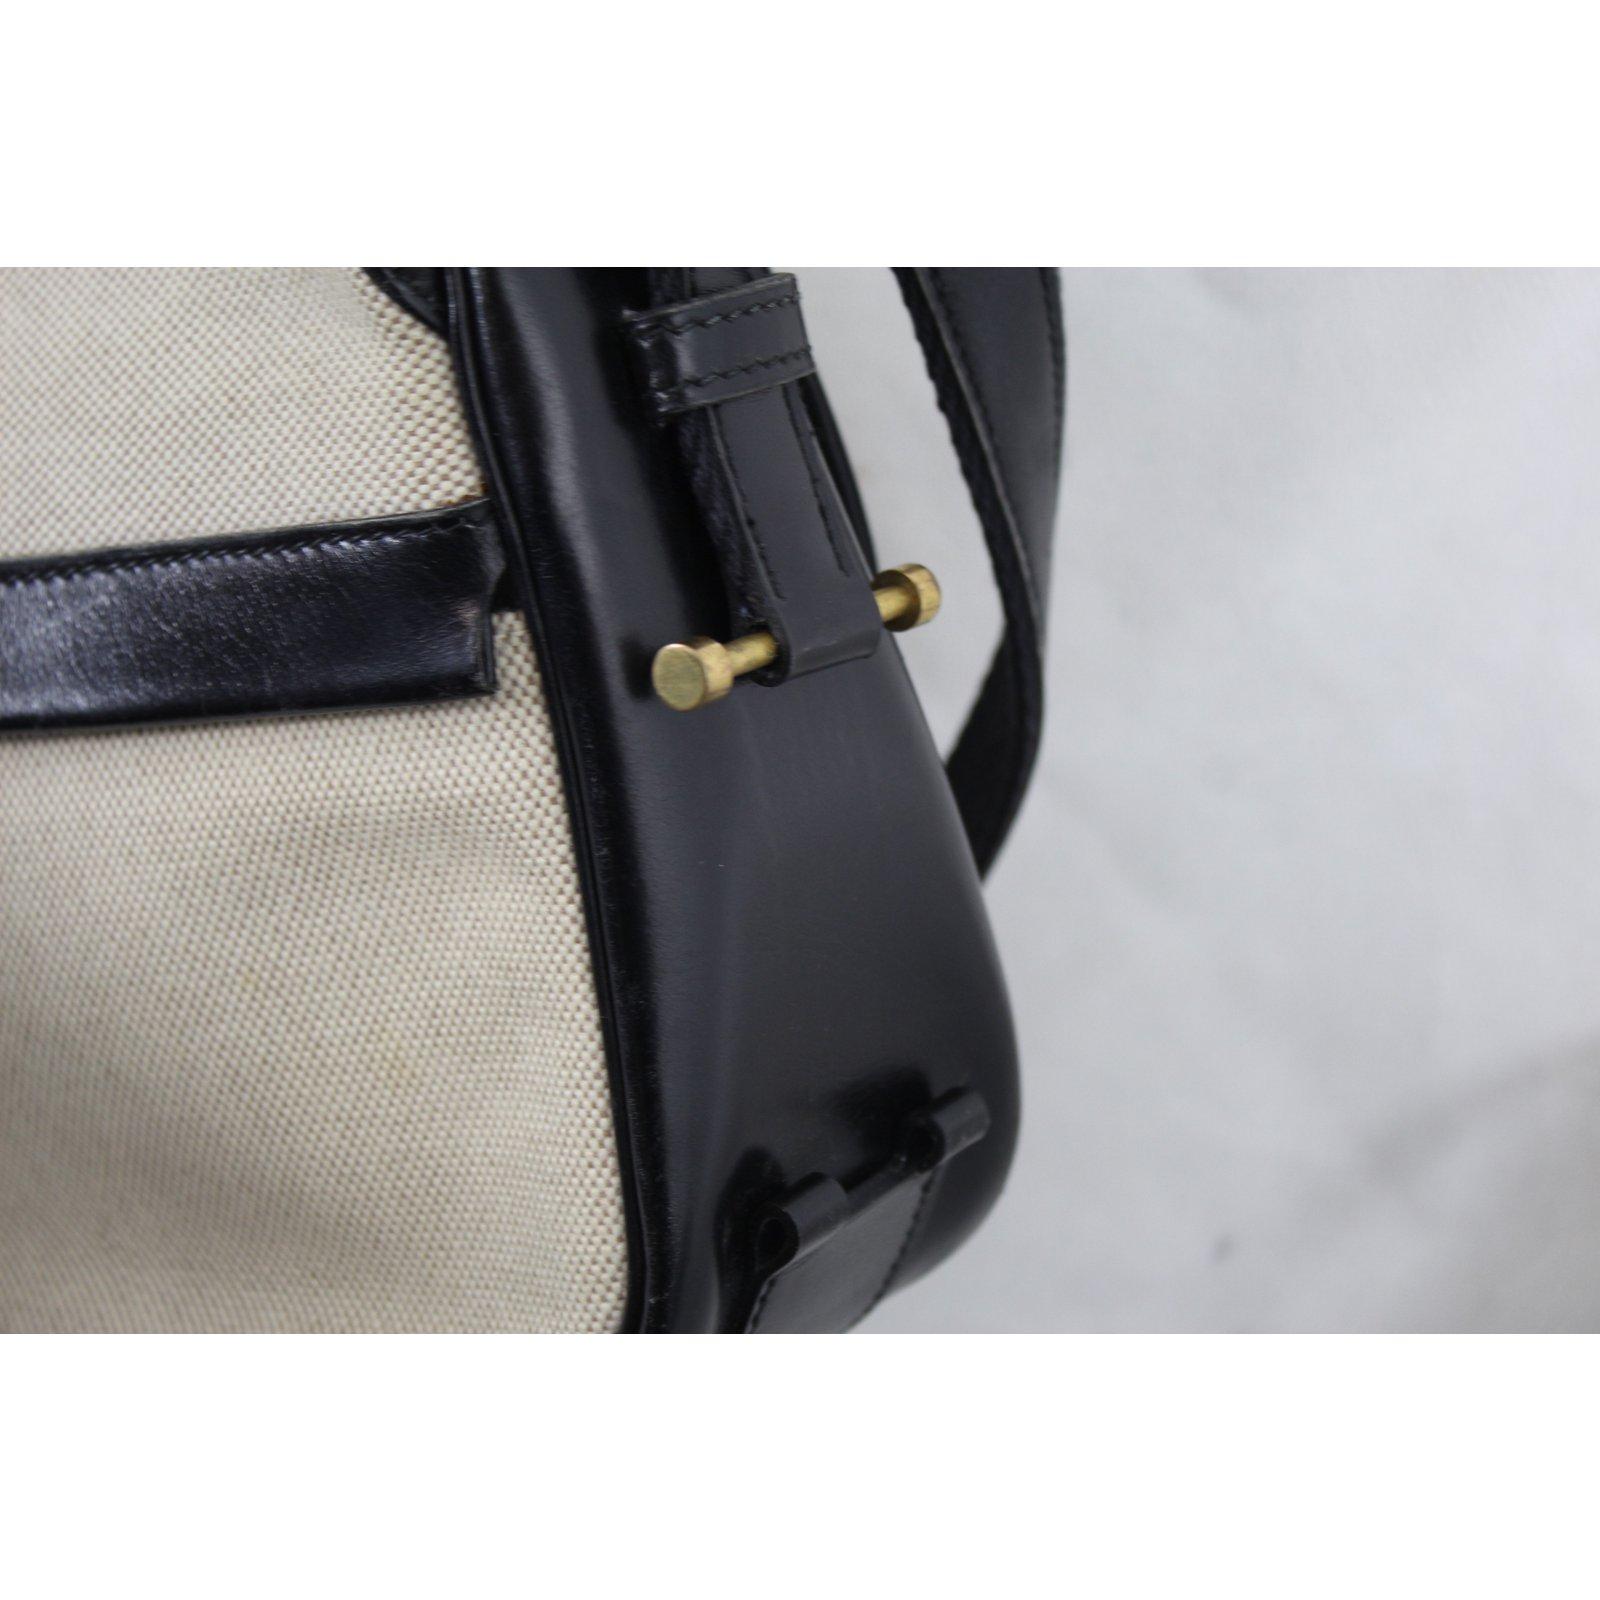 5782d8cf264f Hermès Vintage Noumea bag Handbags Leather Beige ref.60351 - Joli Closet